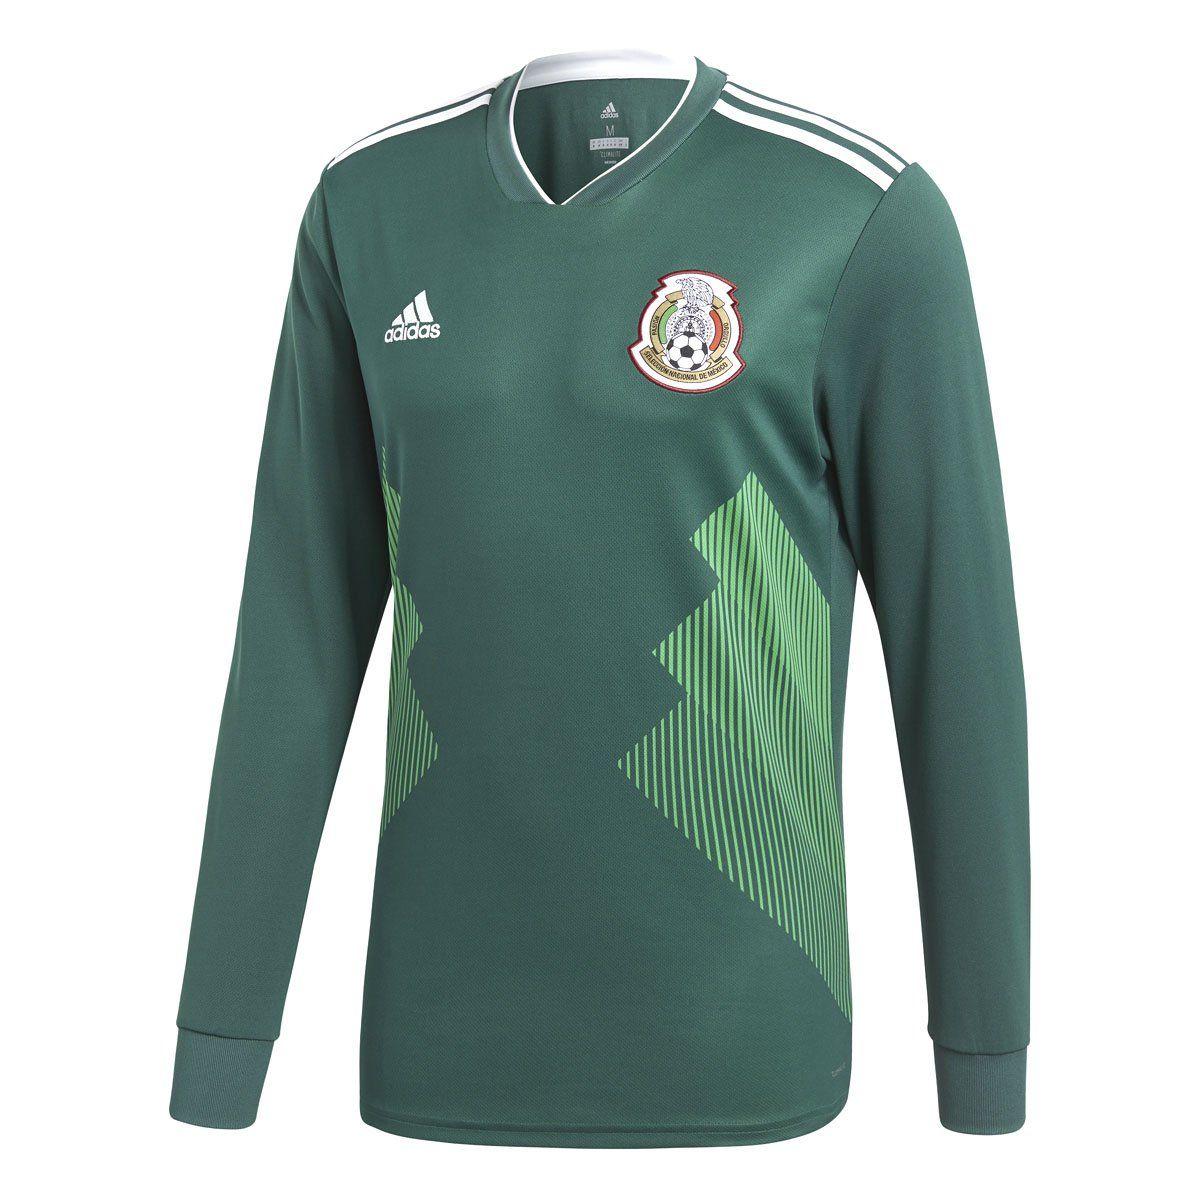 77a9d81fc JERSEY RUSIA 2018 ADIDAS LOCAL RÉPLICA México - CABALLERO | SEARS.COM.MX -